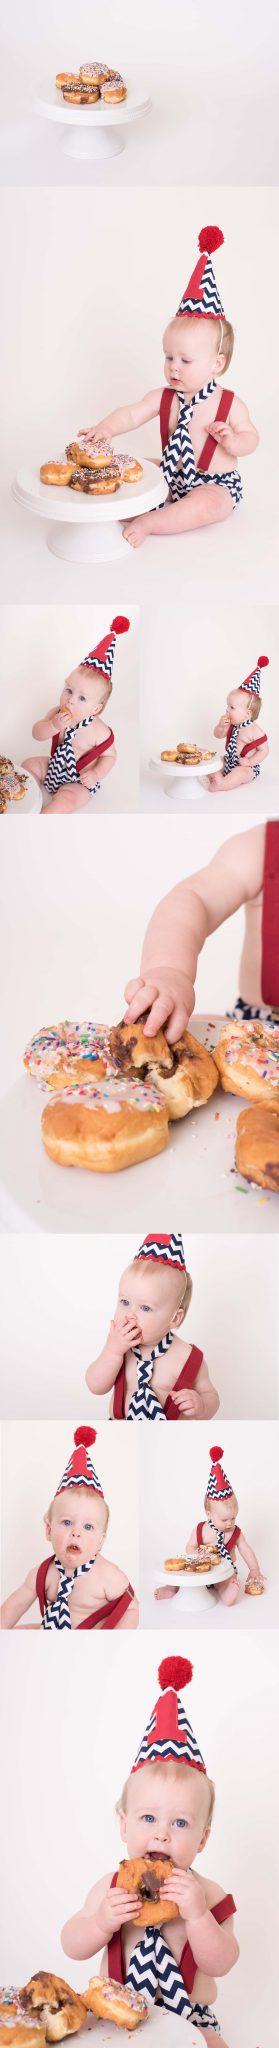 Camden Demerly Is One | A Donut Smash Cake | Luminant Photography | Lafayette, Indiana Photographer | Lafayette, Indiana Family Photographer